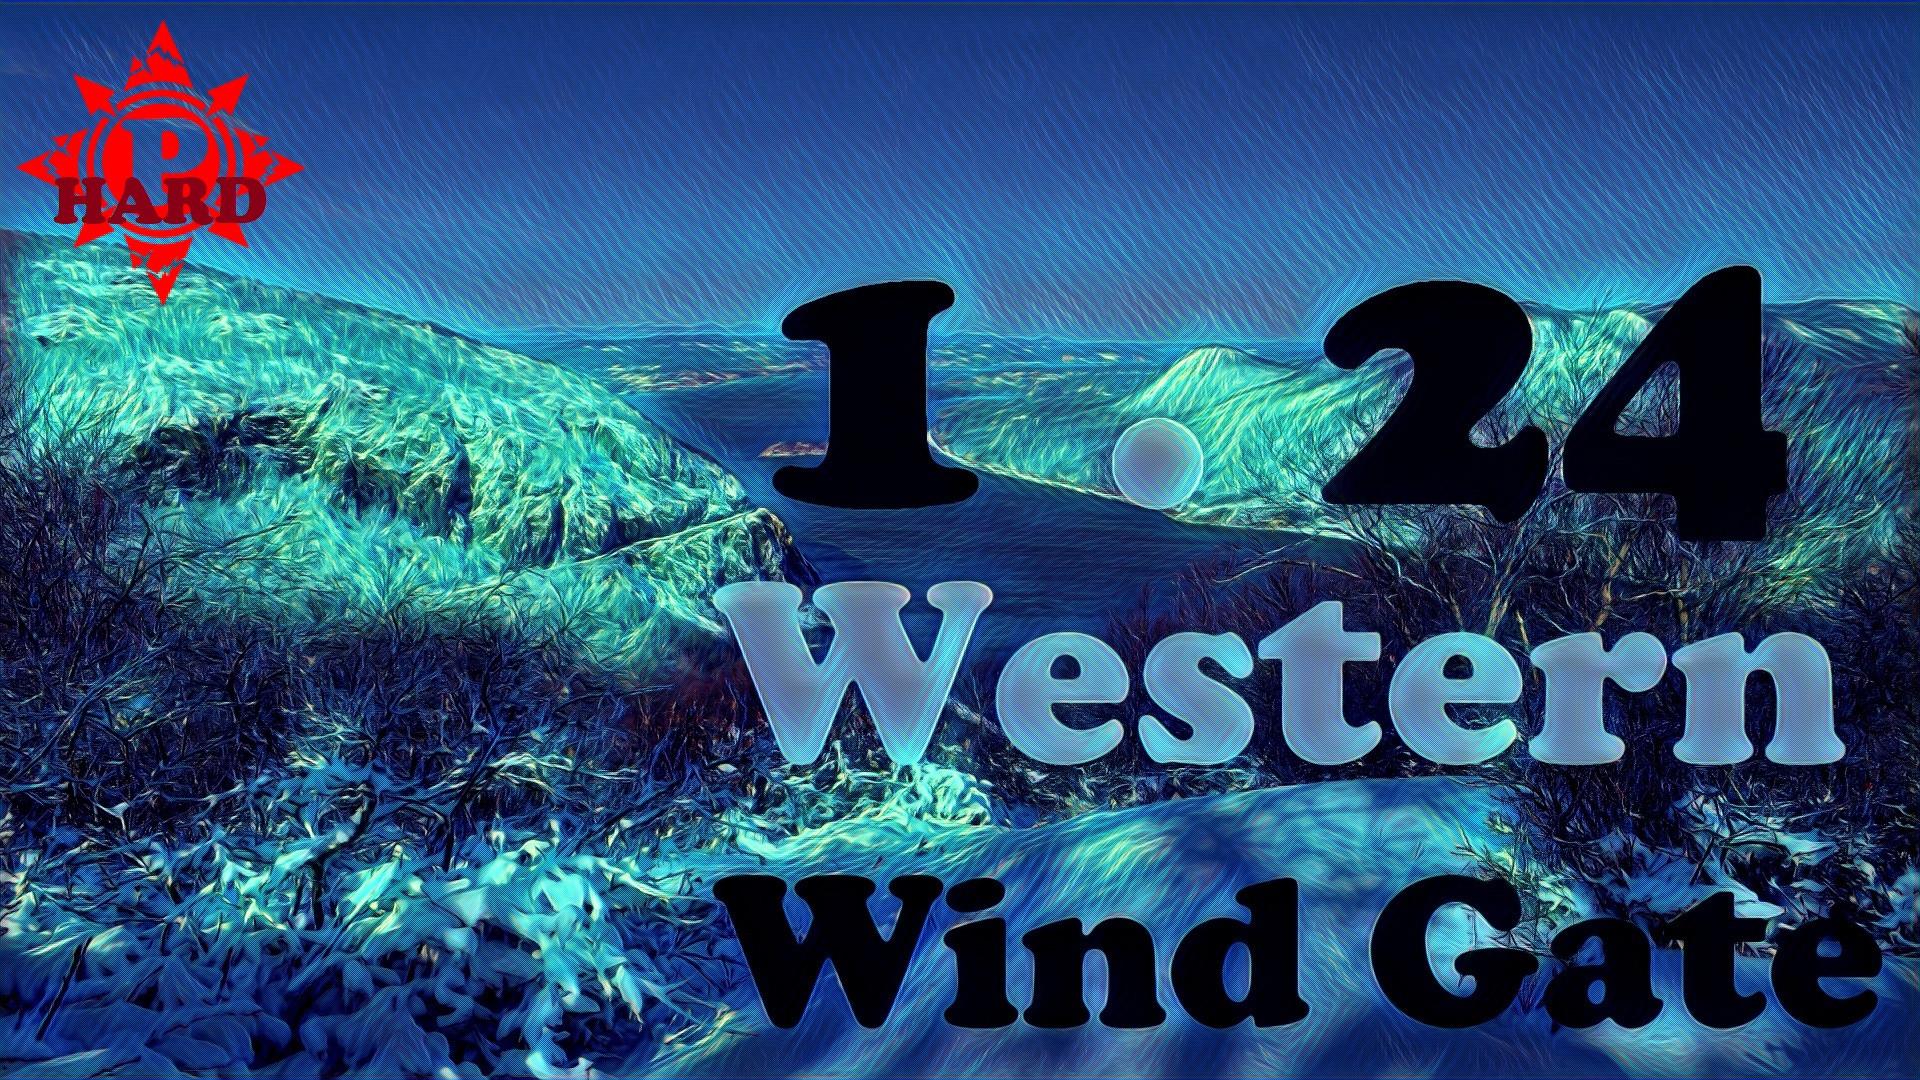 1.24 - Western Wind Gate